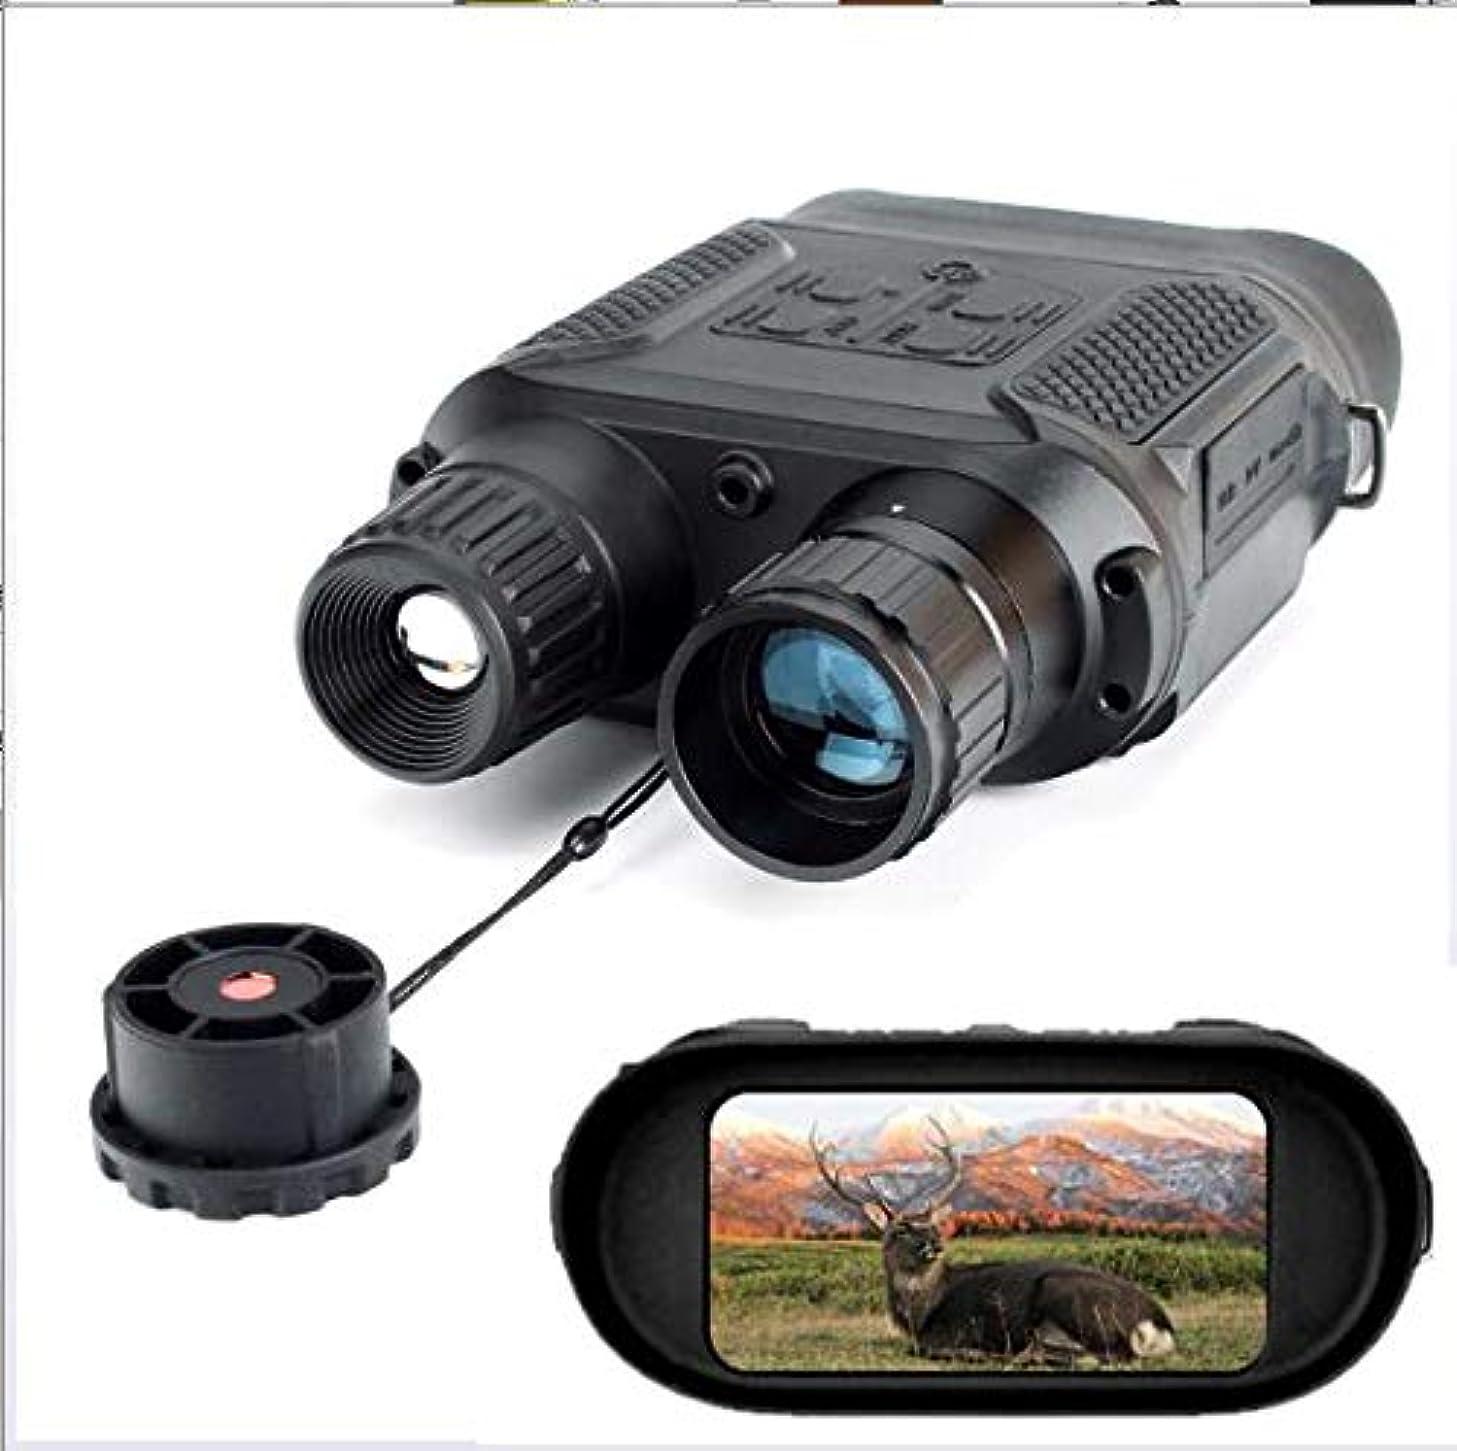 KASIQIWA 7X31 Binoculars for Adults, Digital Night Visions Telescope 2 Inch TFT Display Built-in IR Illuminator Photo Video Recorder Waterproof for Outdoor Hunting Hiking Sightseeing